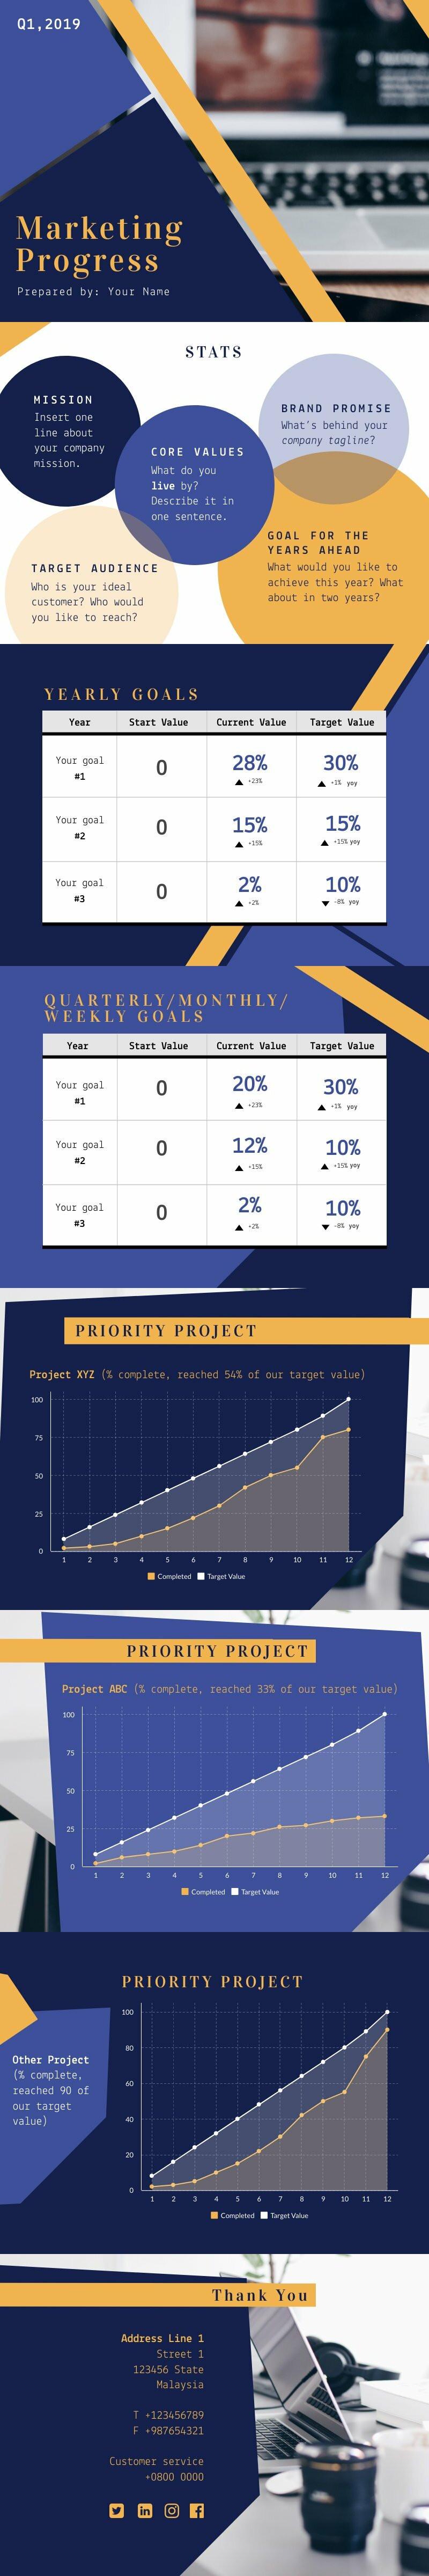 Progress Report Marketing